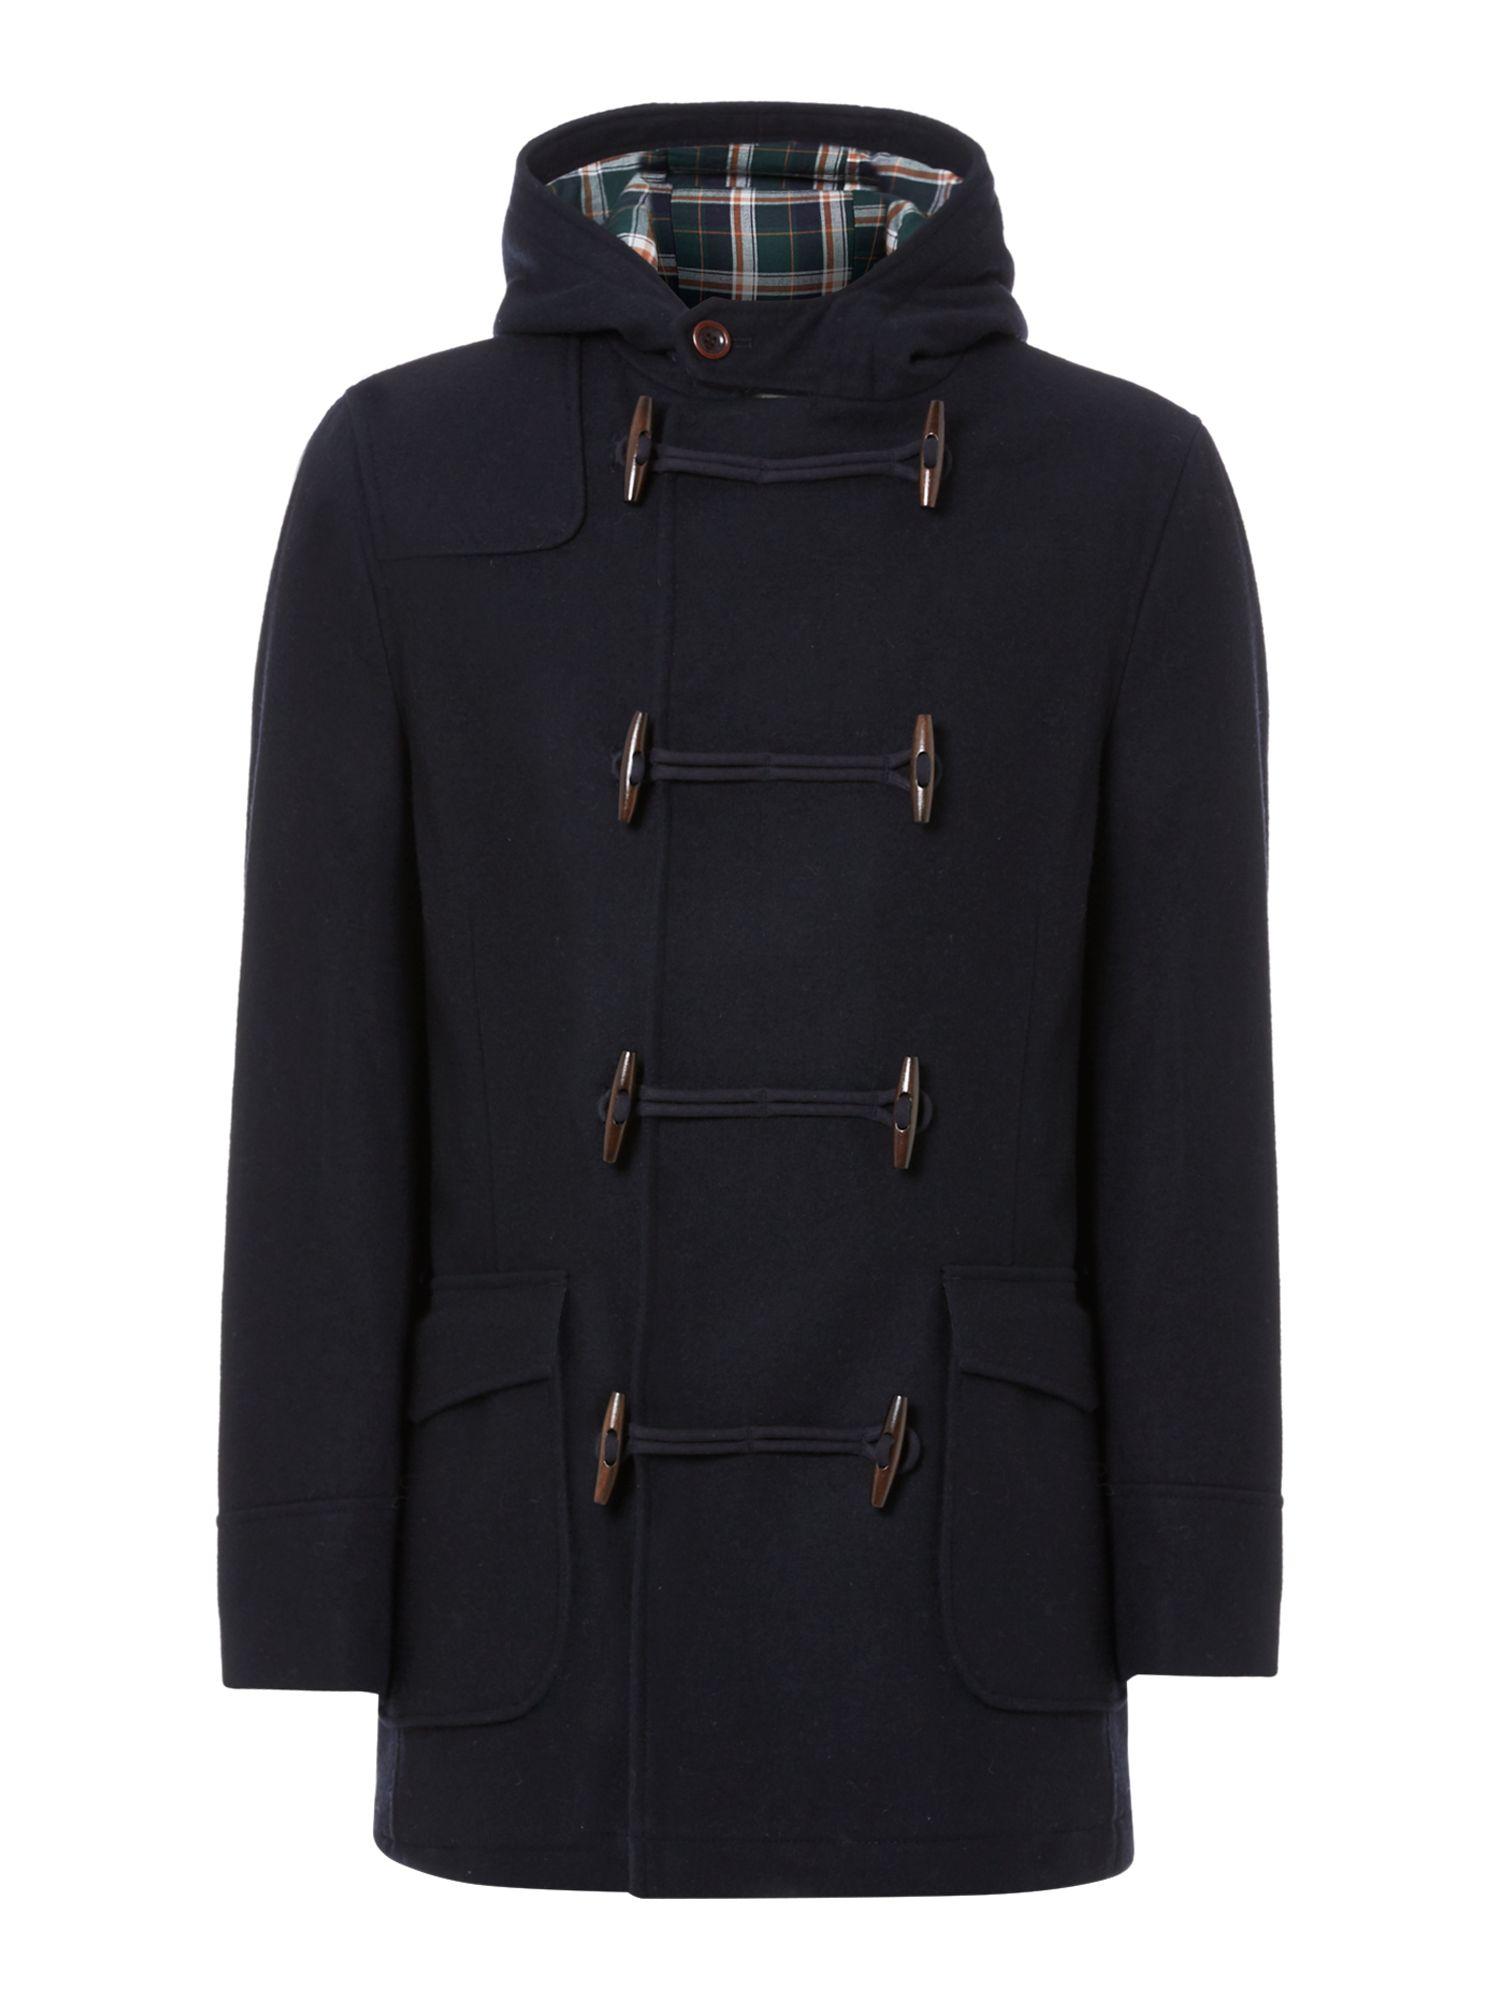 Duffle Coat Toggle Fasteners   Down Coat